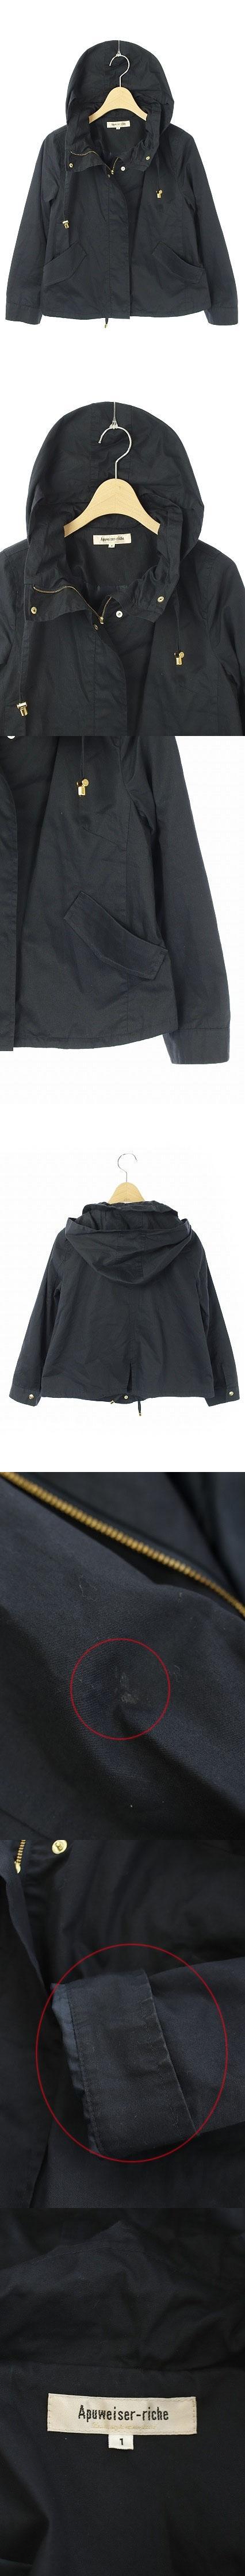 19SS ジャケット マウンテンパーカー ショートブルゾン ジップアップ 1 紺 /YS ■OS ■SH